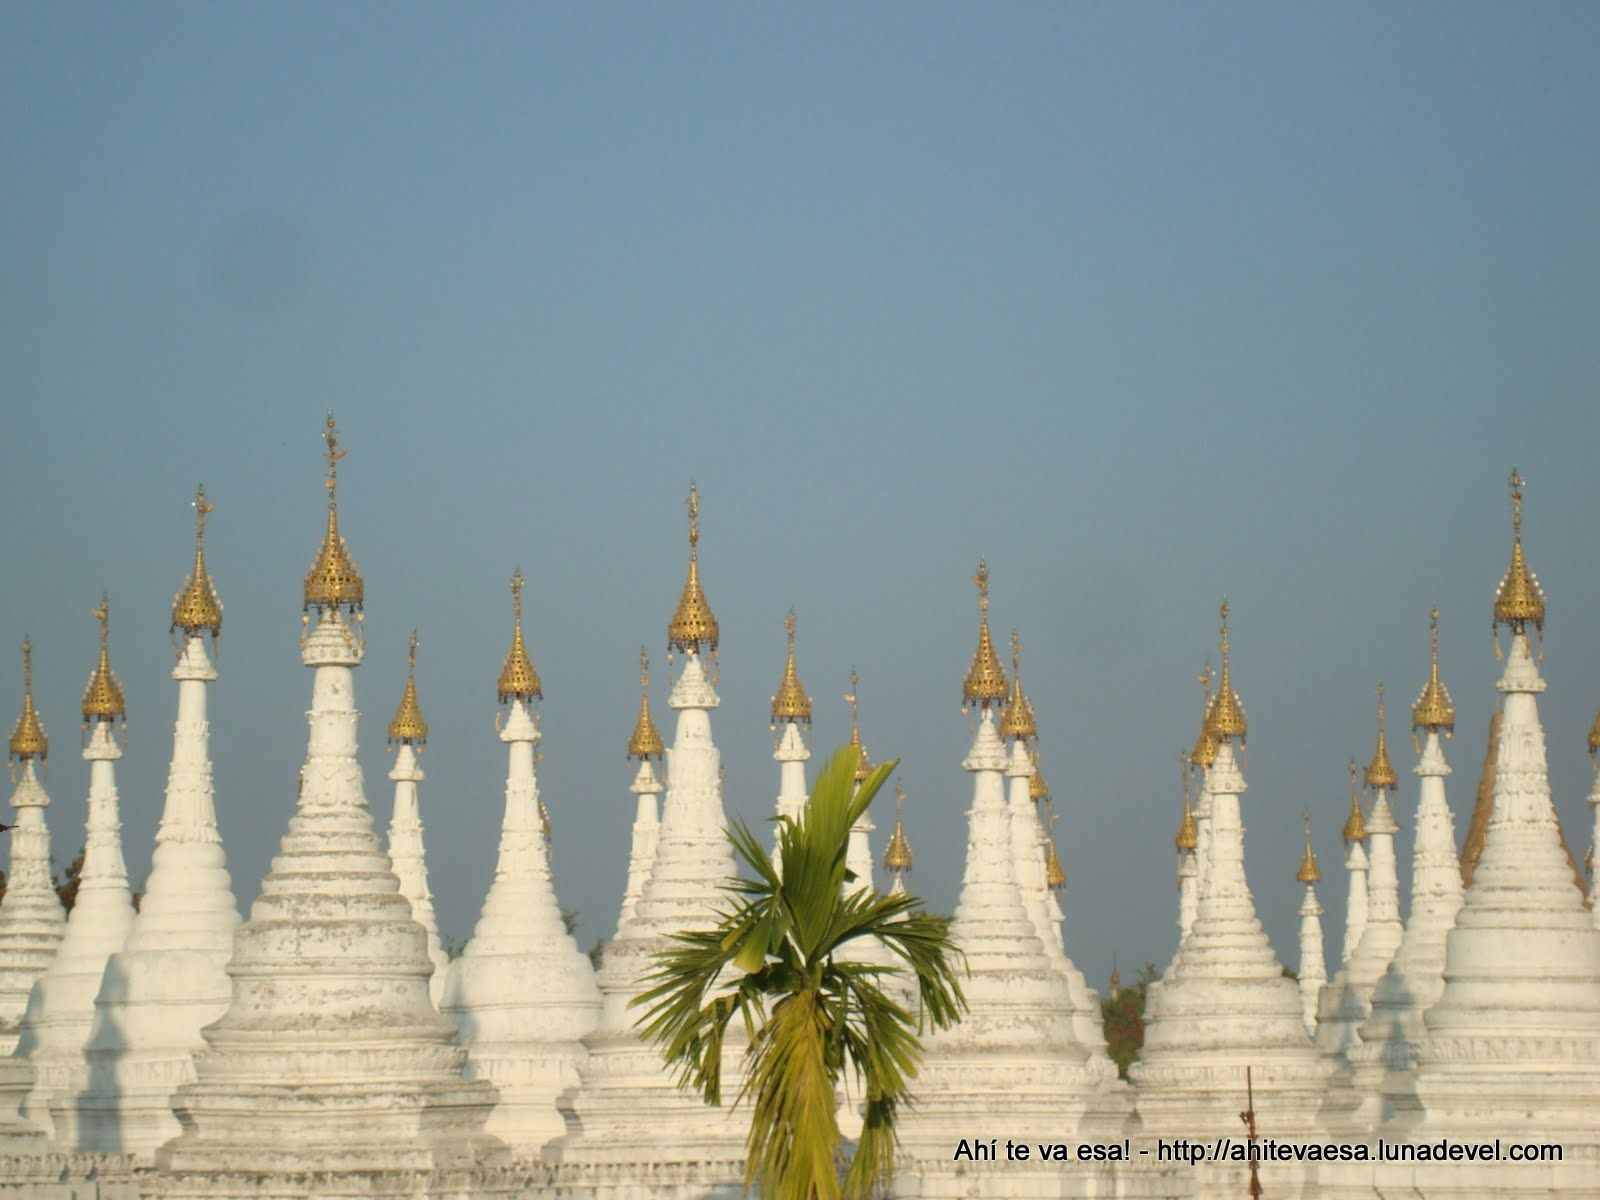 View from Kuthodaw Pagoda, Mandalay (Myanmar)